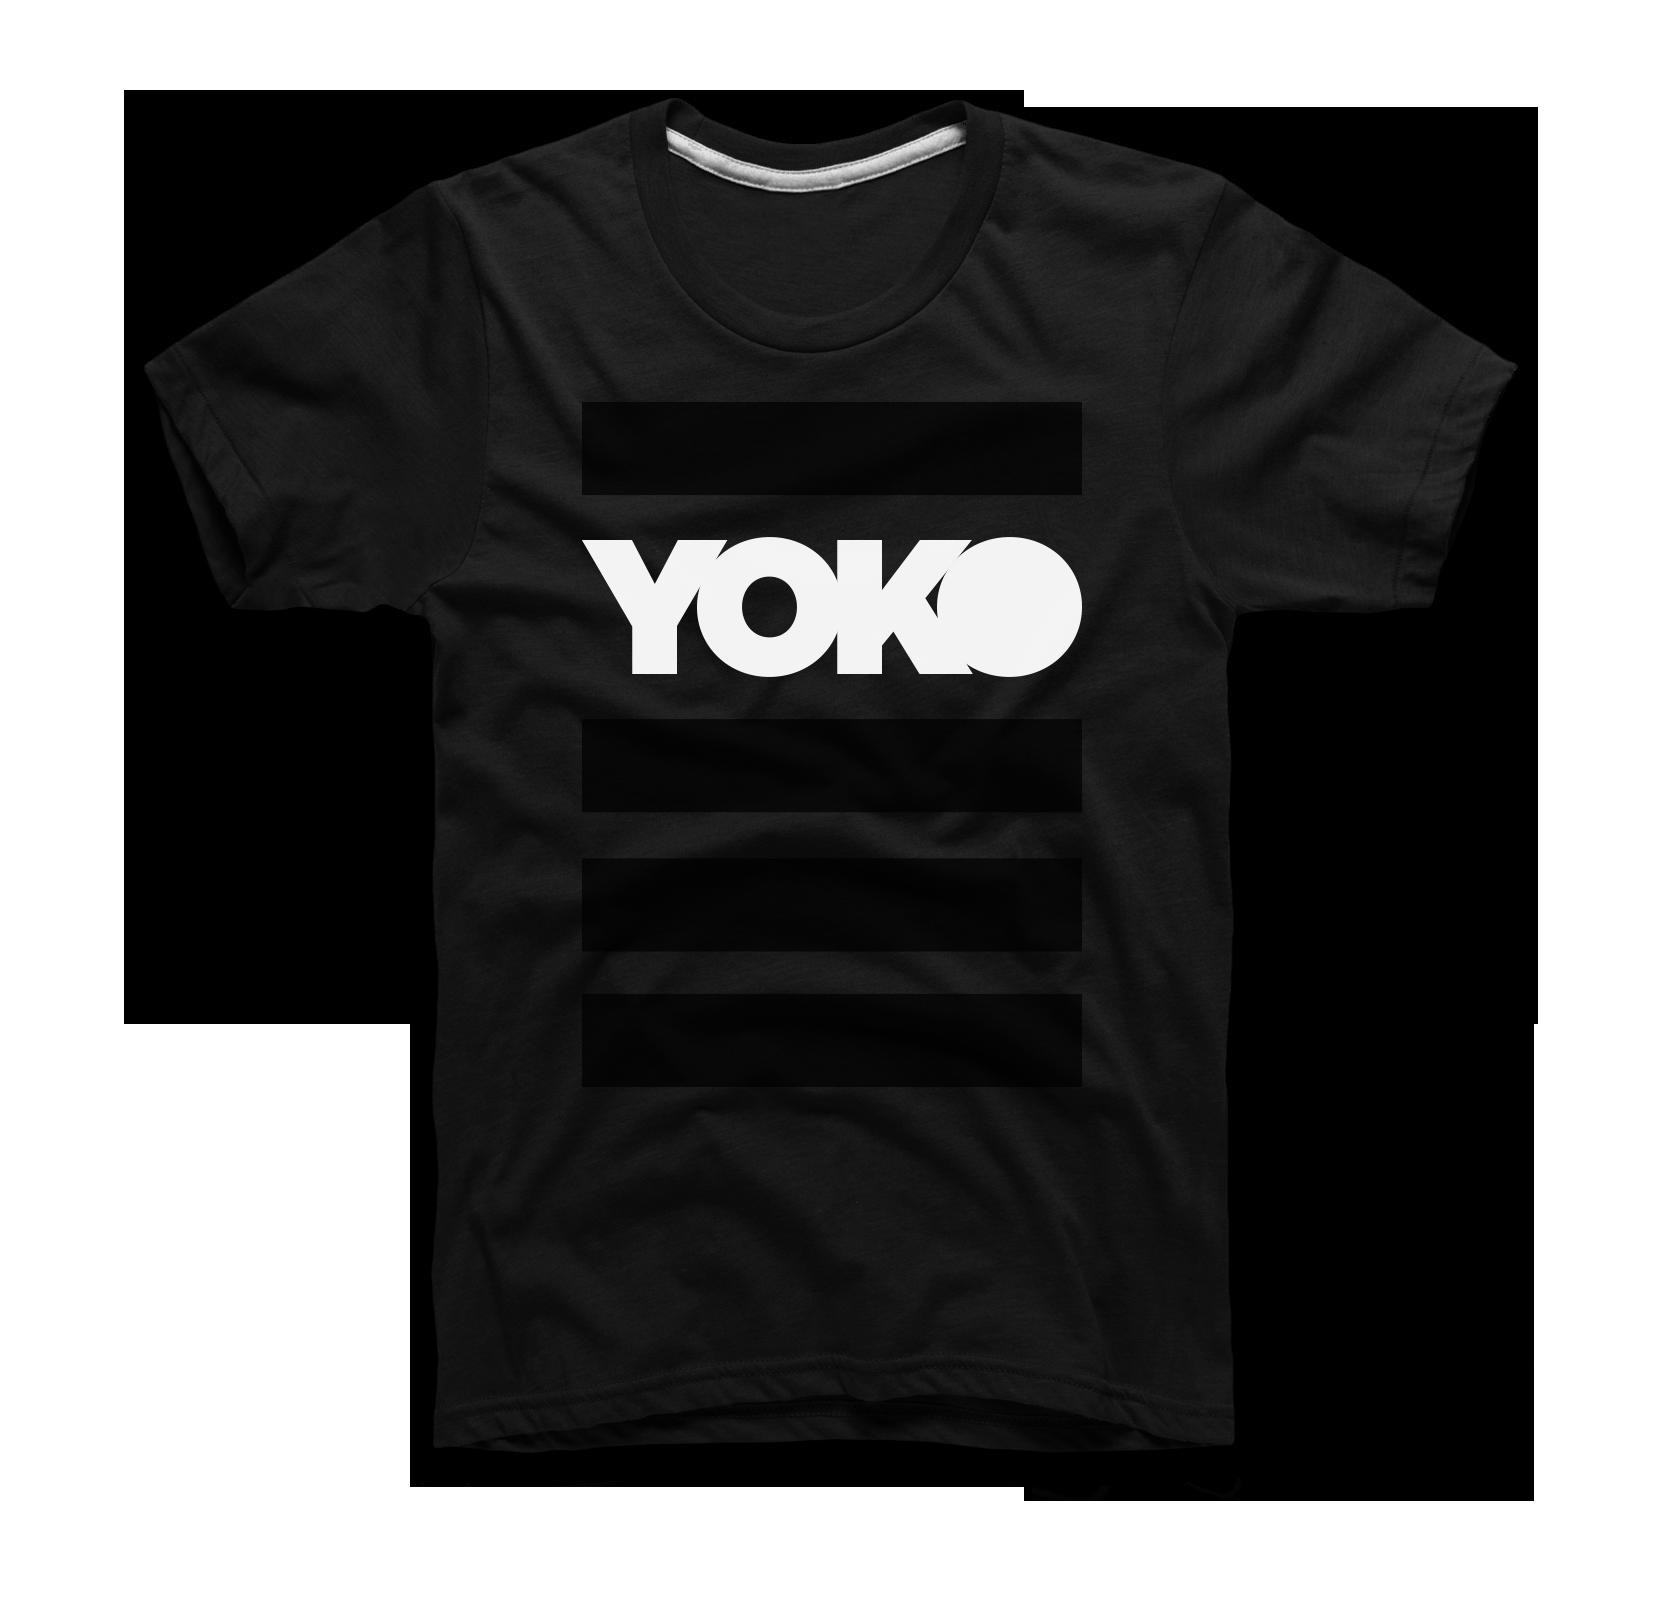 YOKO_Tshirt_Mockup2.png